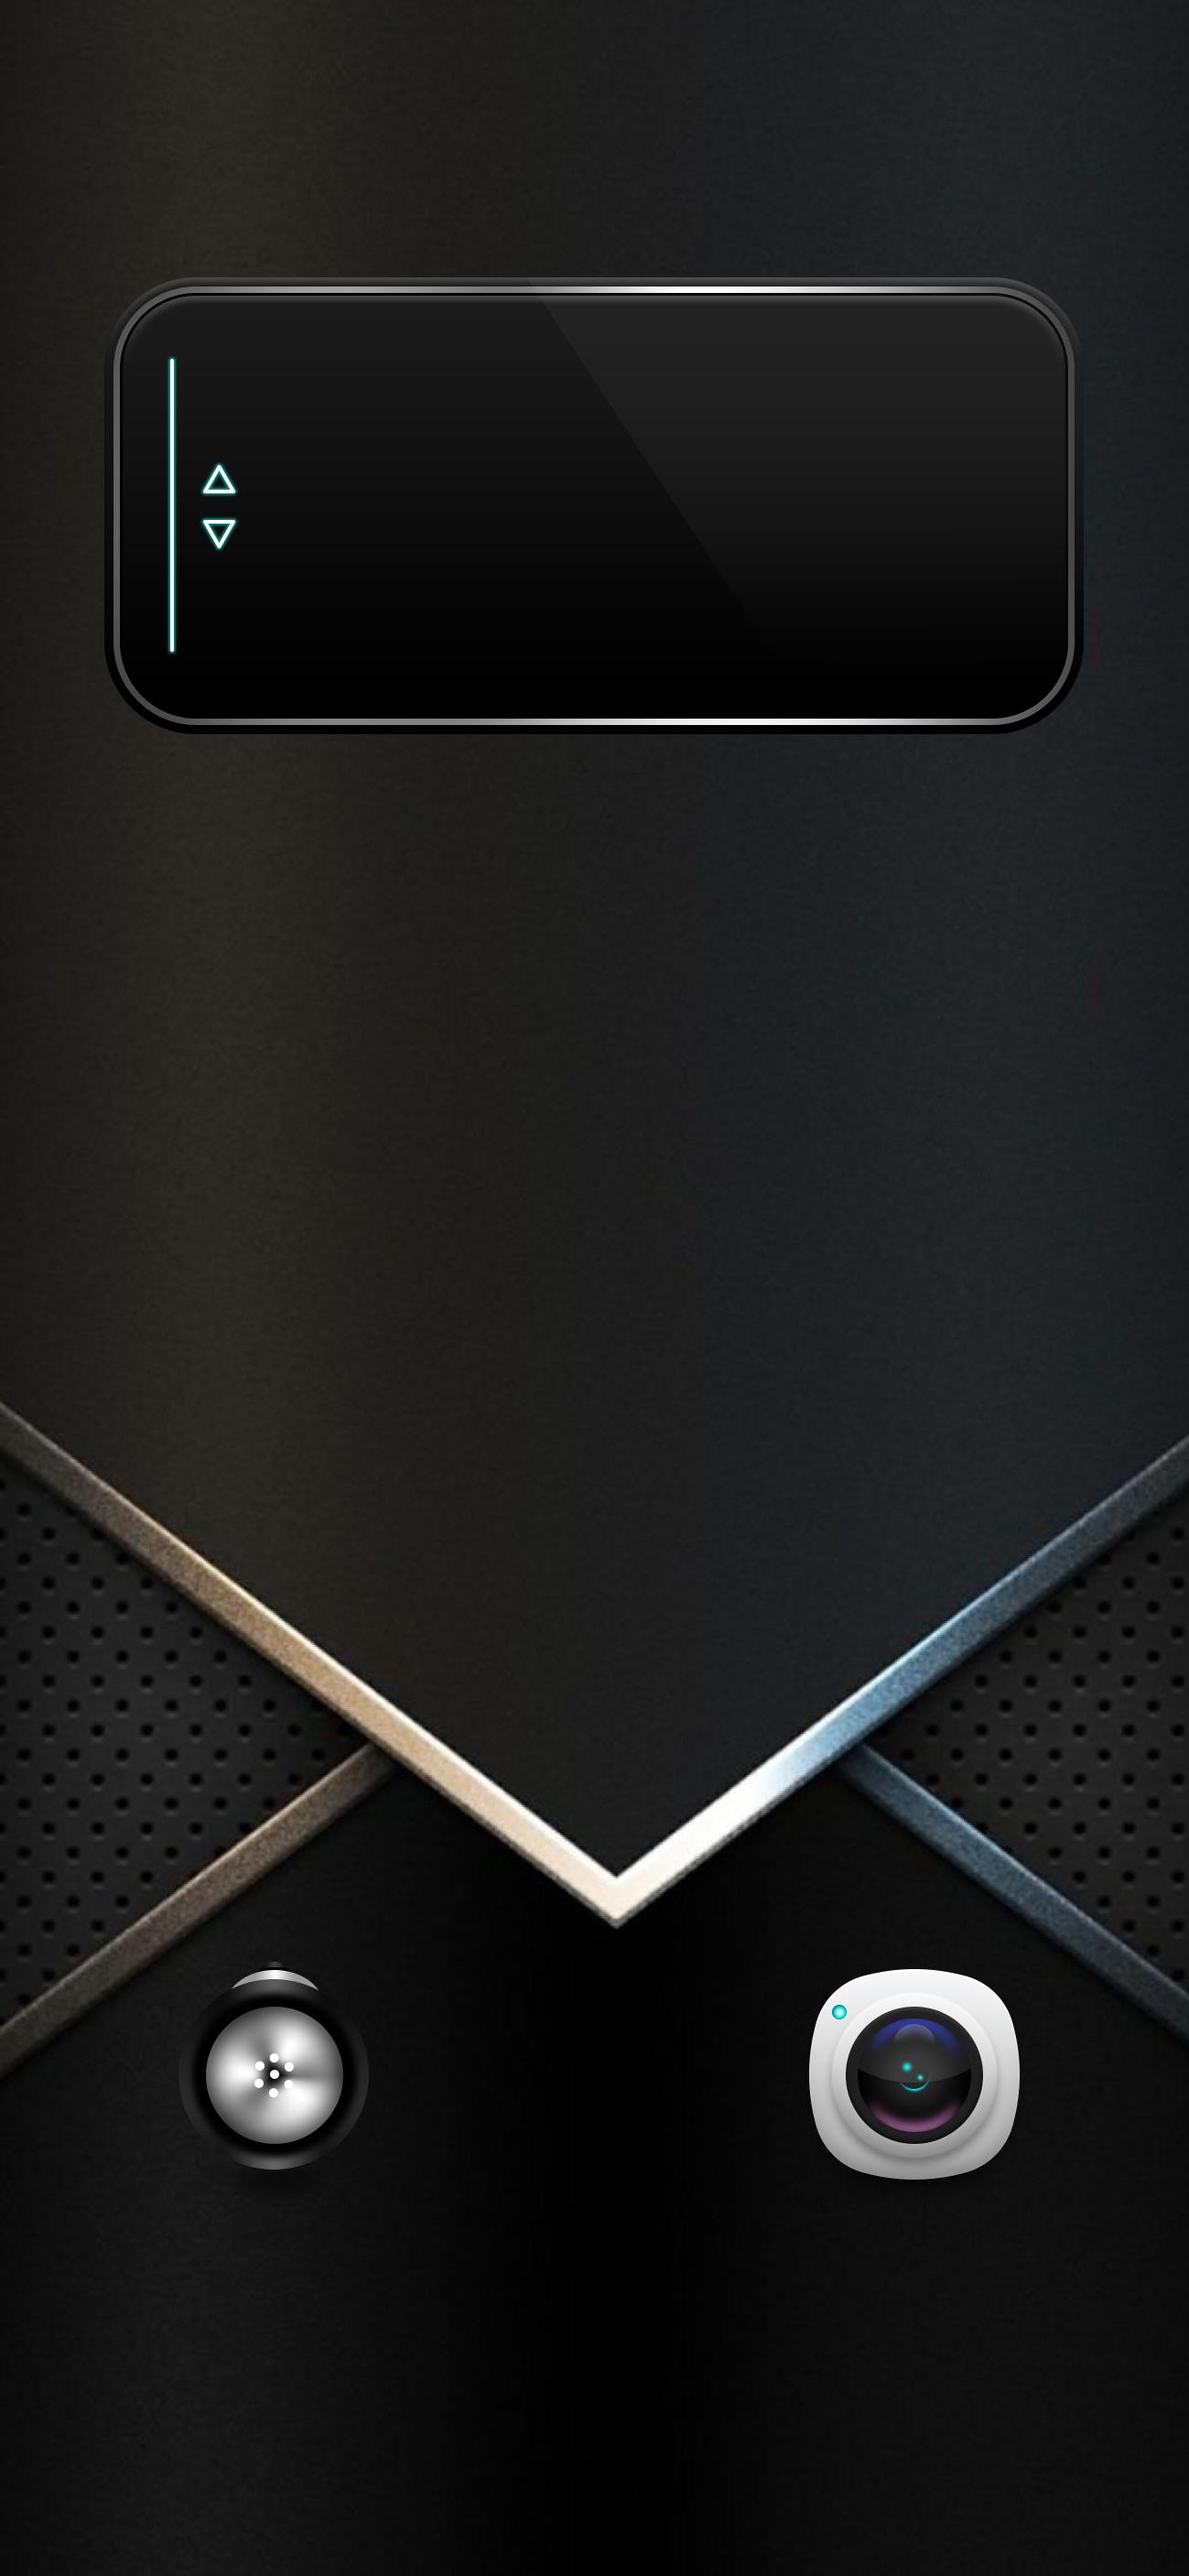 Wallpaper Iphone X Iphone Latest Iphone Iphone Wallpaper